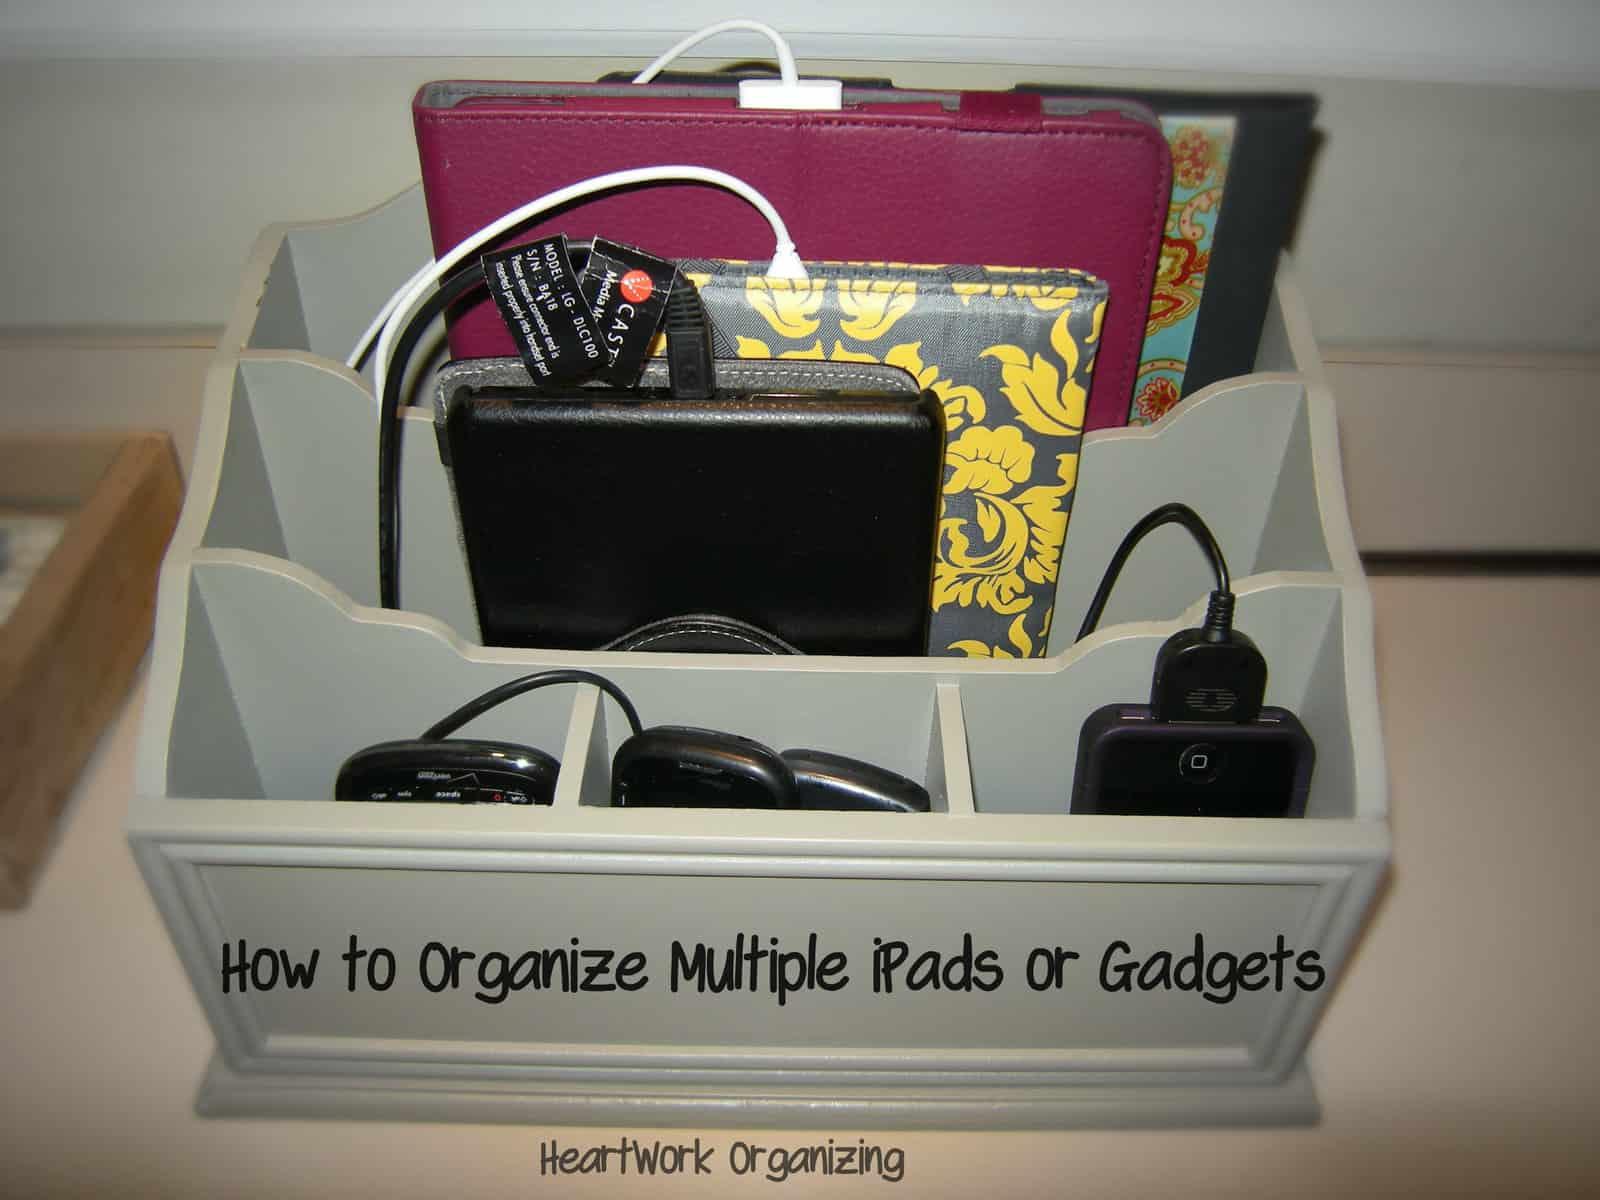 Gadget Organizer For Ipads Kindles Heartwork Organizing Tips Ipad